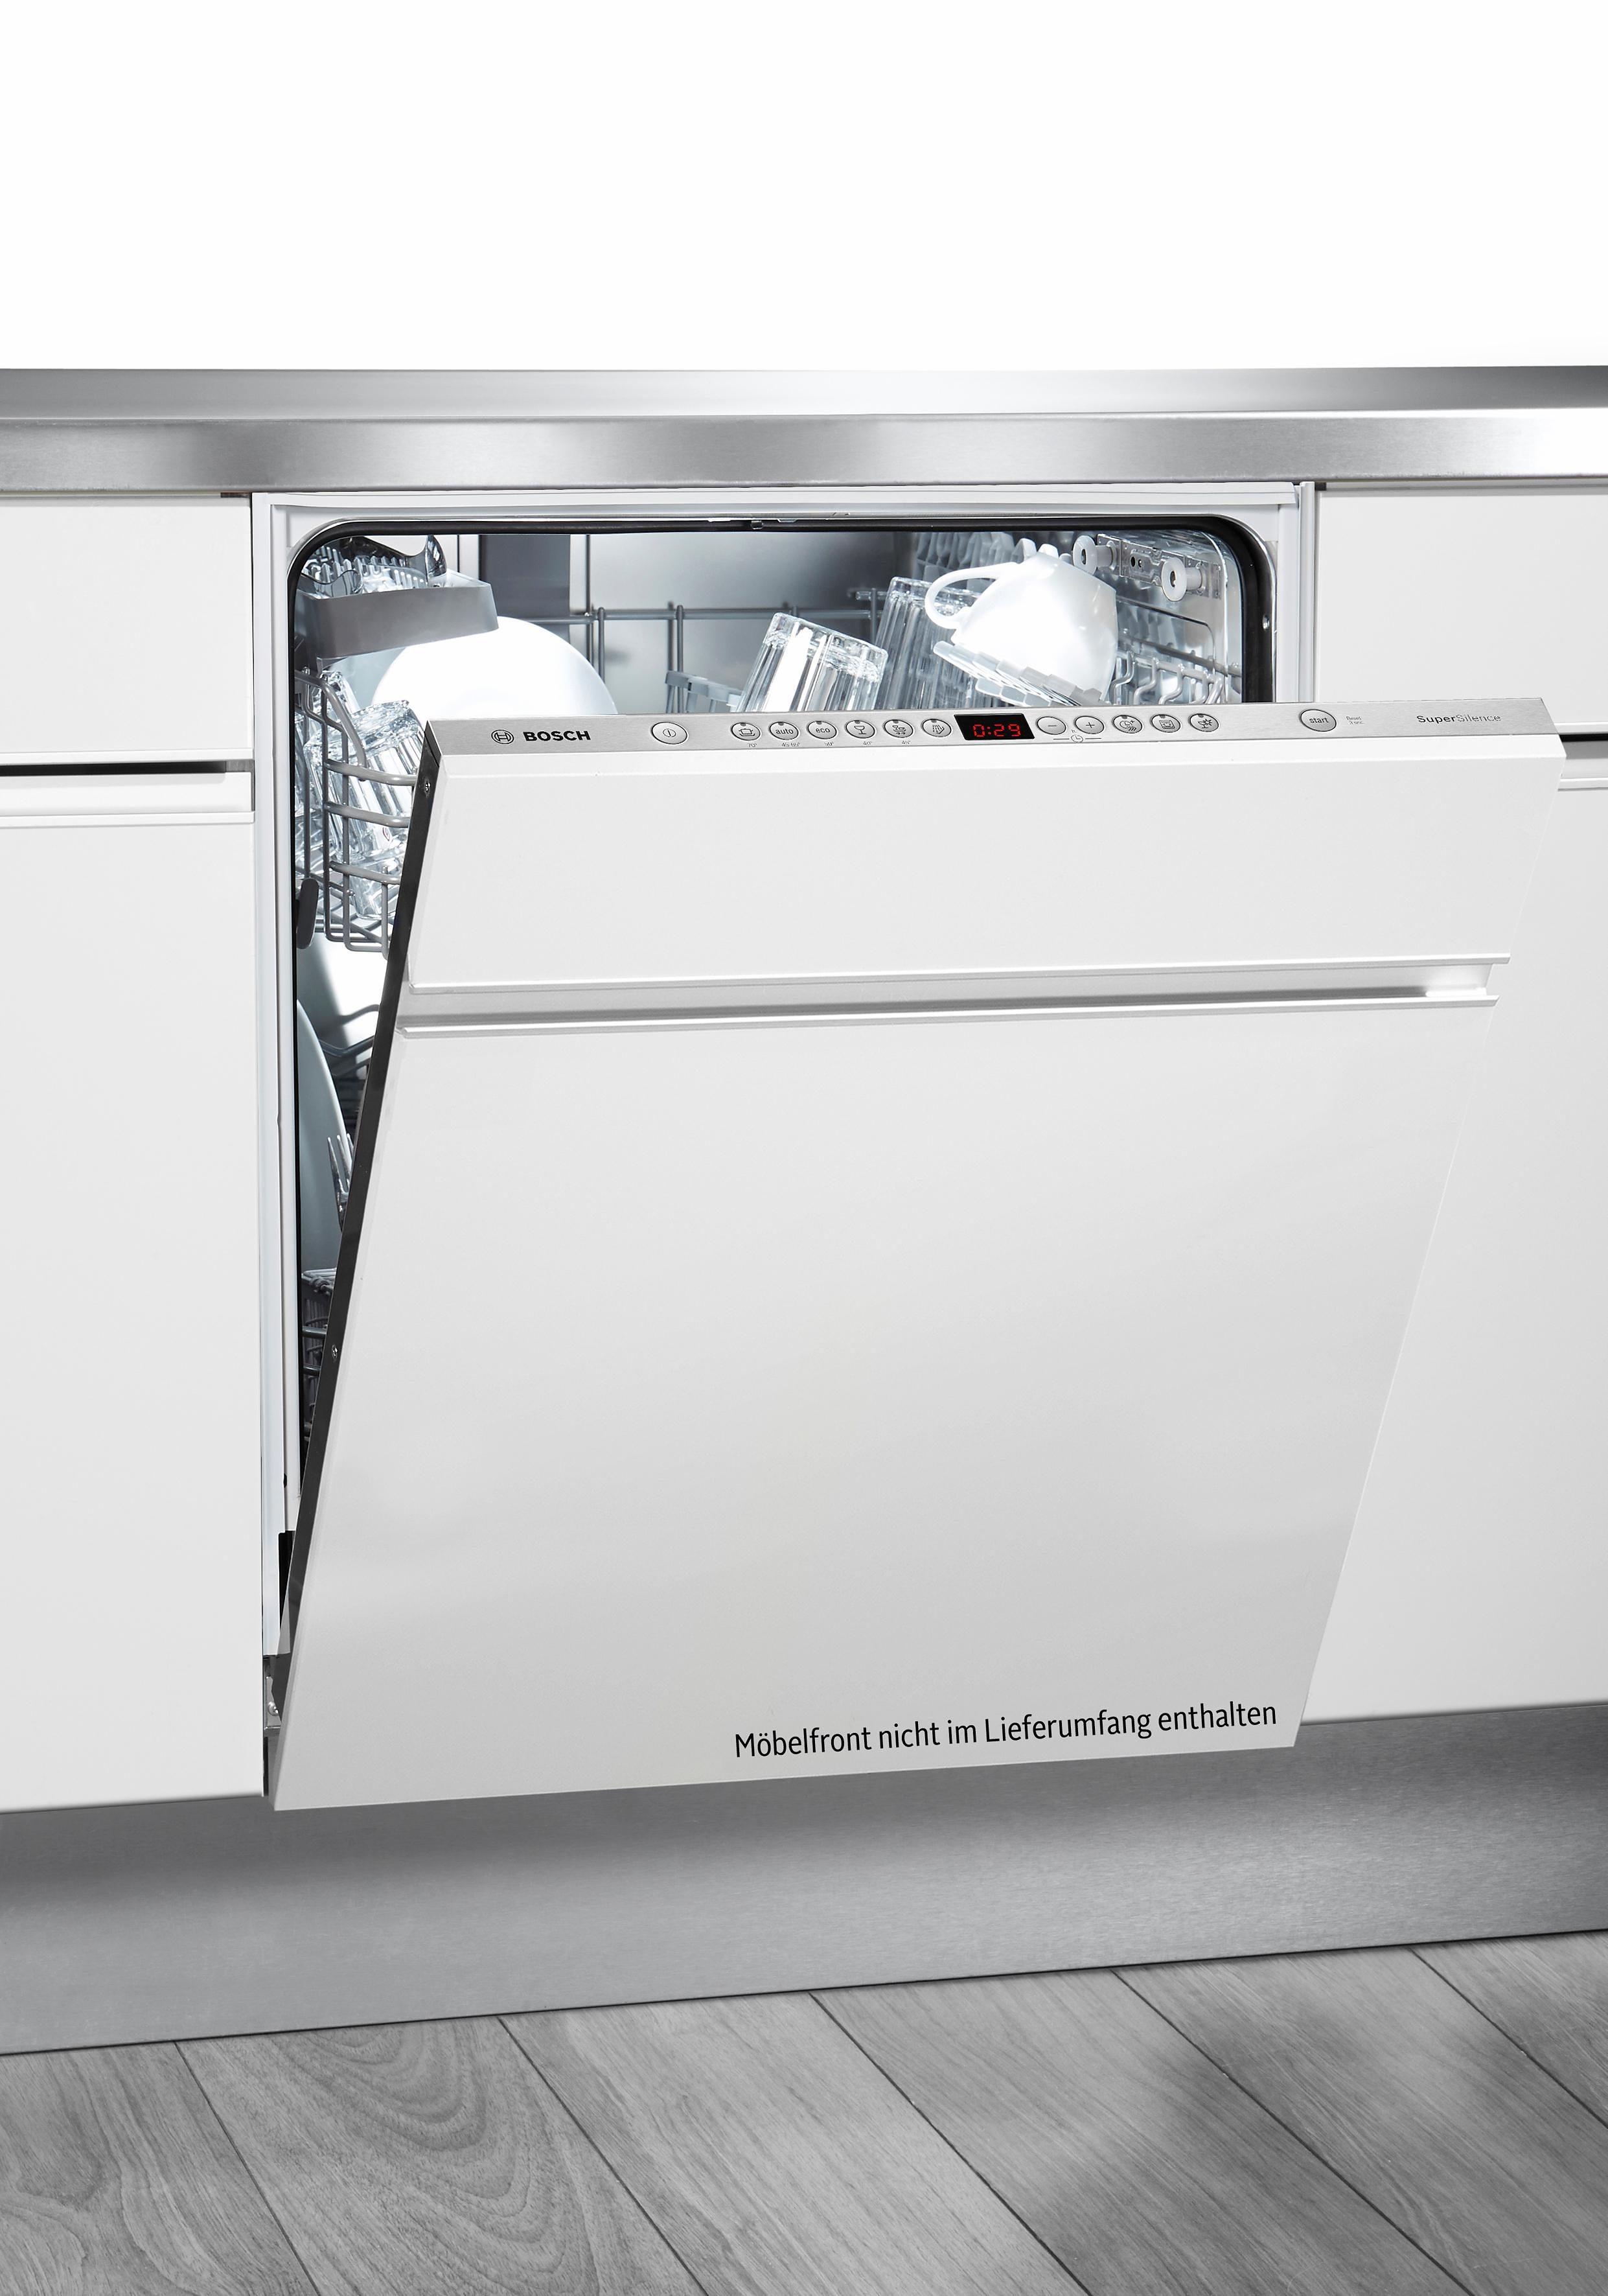 Bosch vollintegrierbarer Einbaugeschirrspüler SMV63N60EU, Energieklasse: A+++, 9,5 l, 13 Maßgedecke